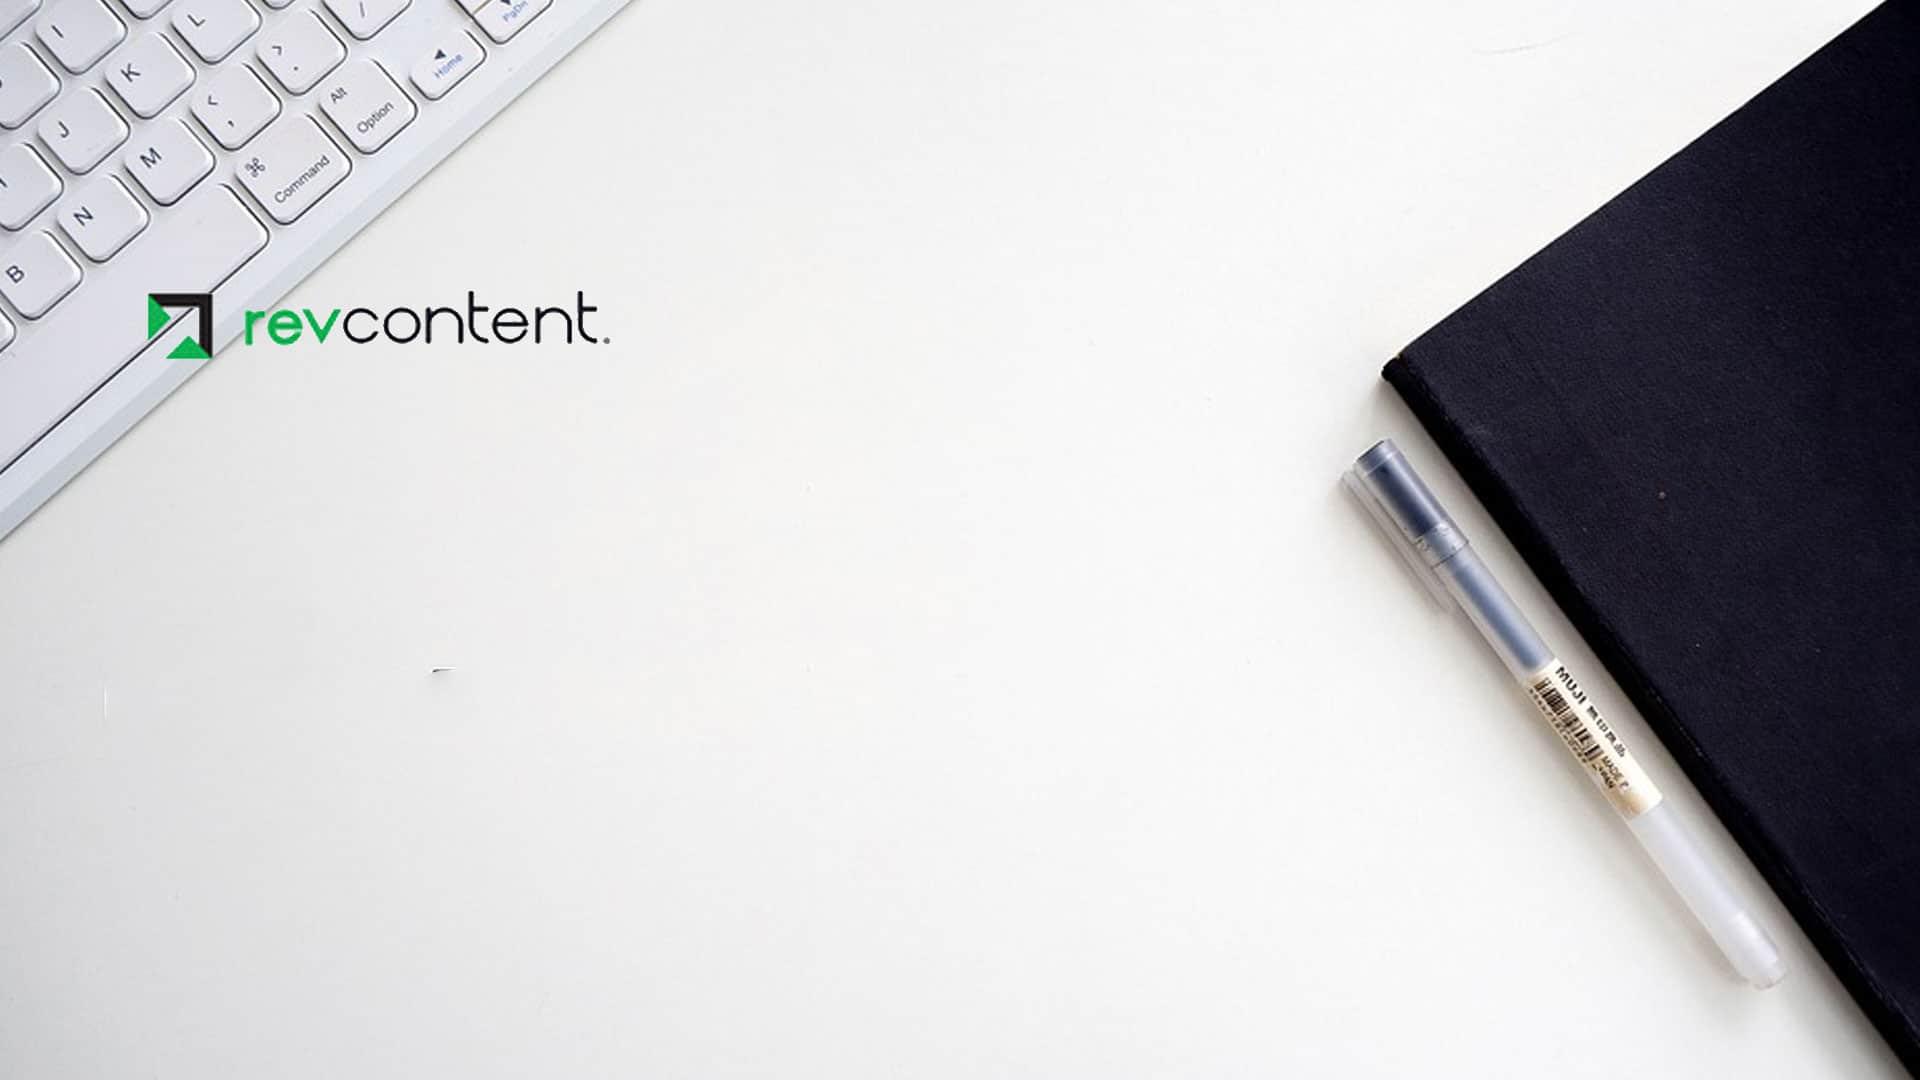 Content Marketing Platform Revcontent Expands to Brazil